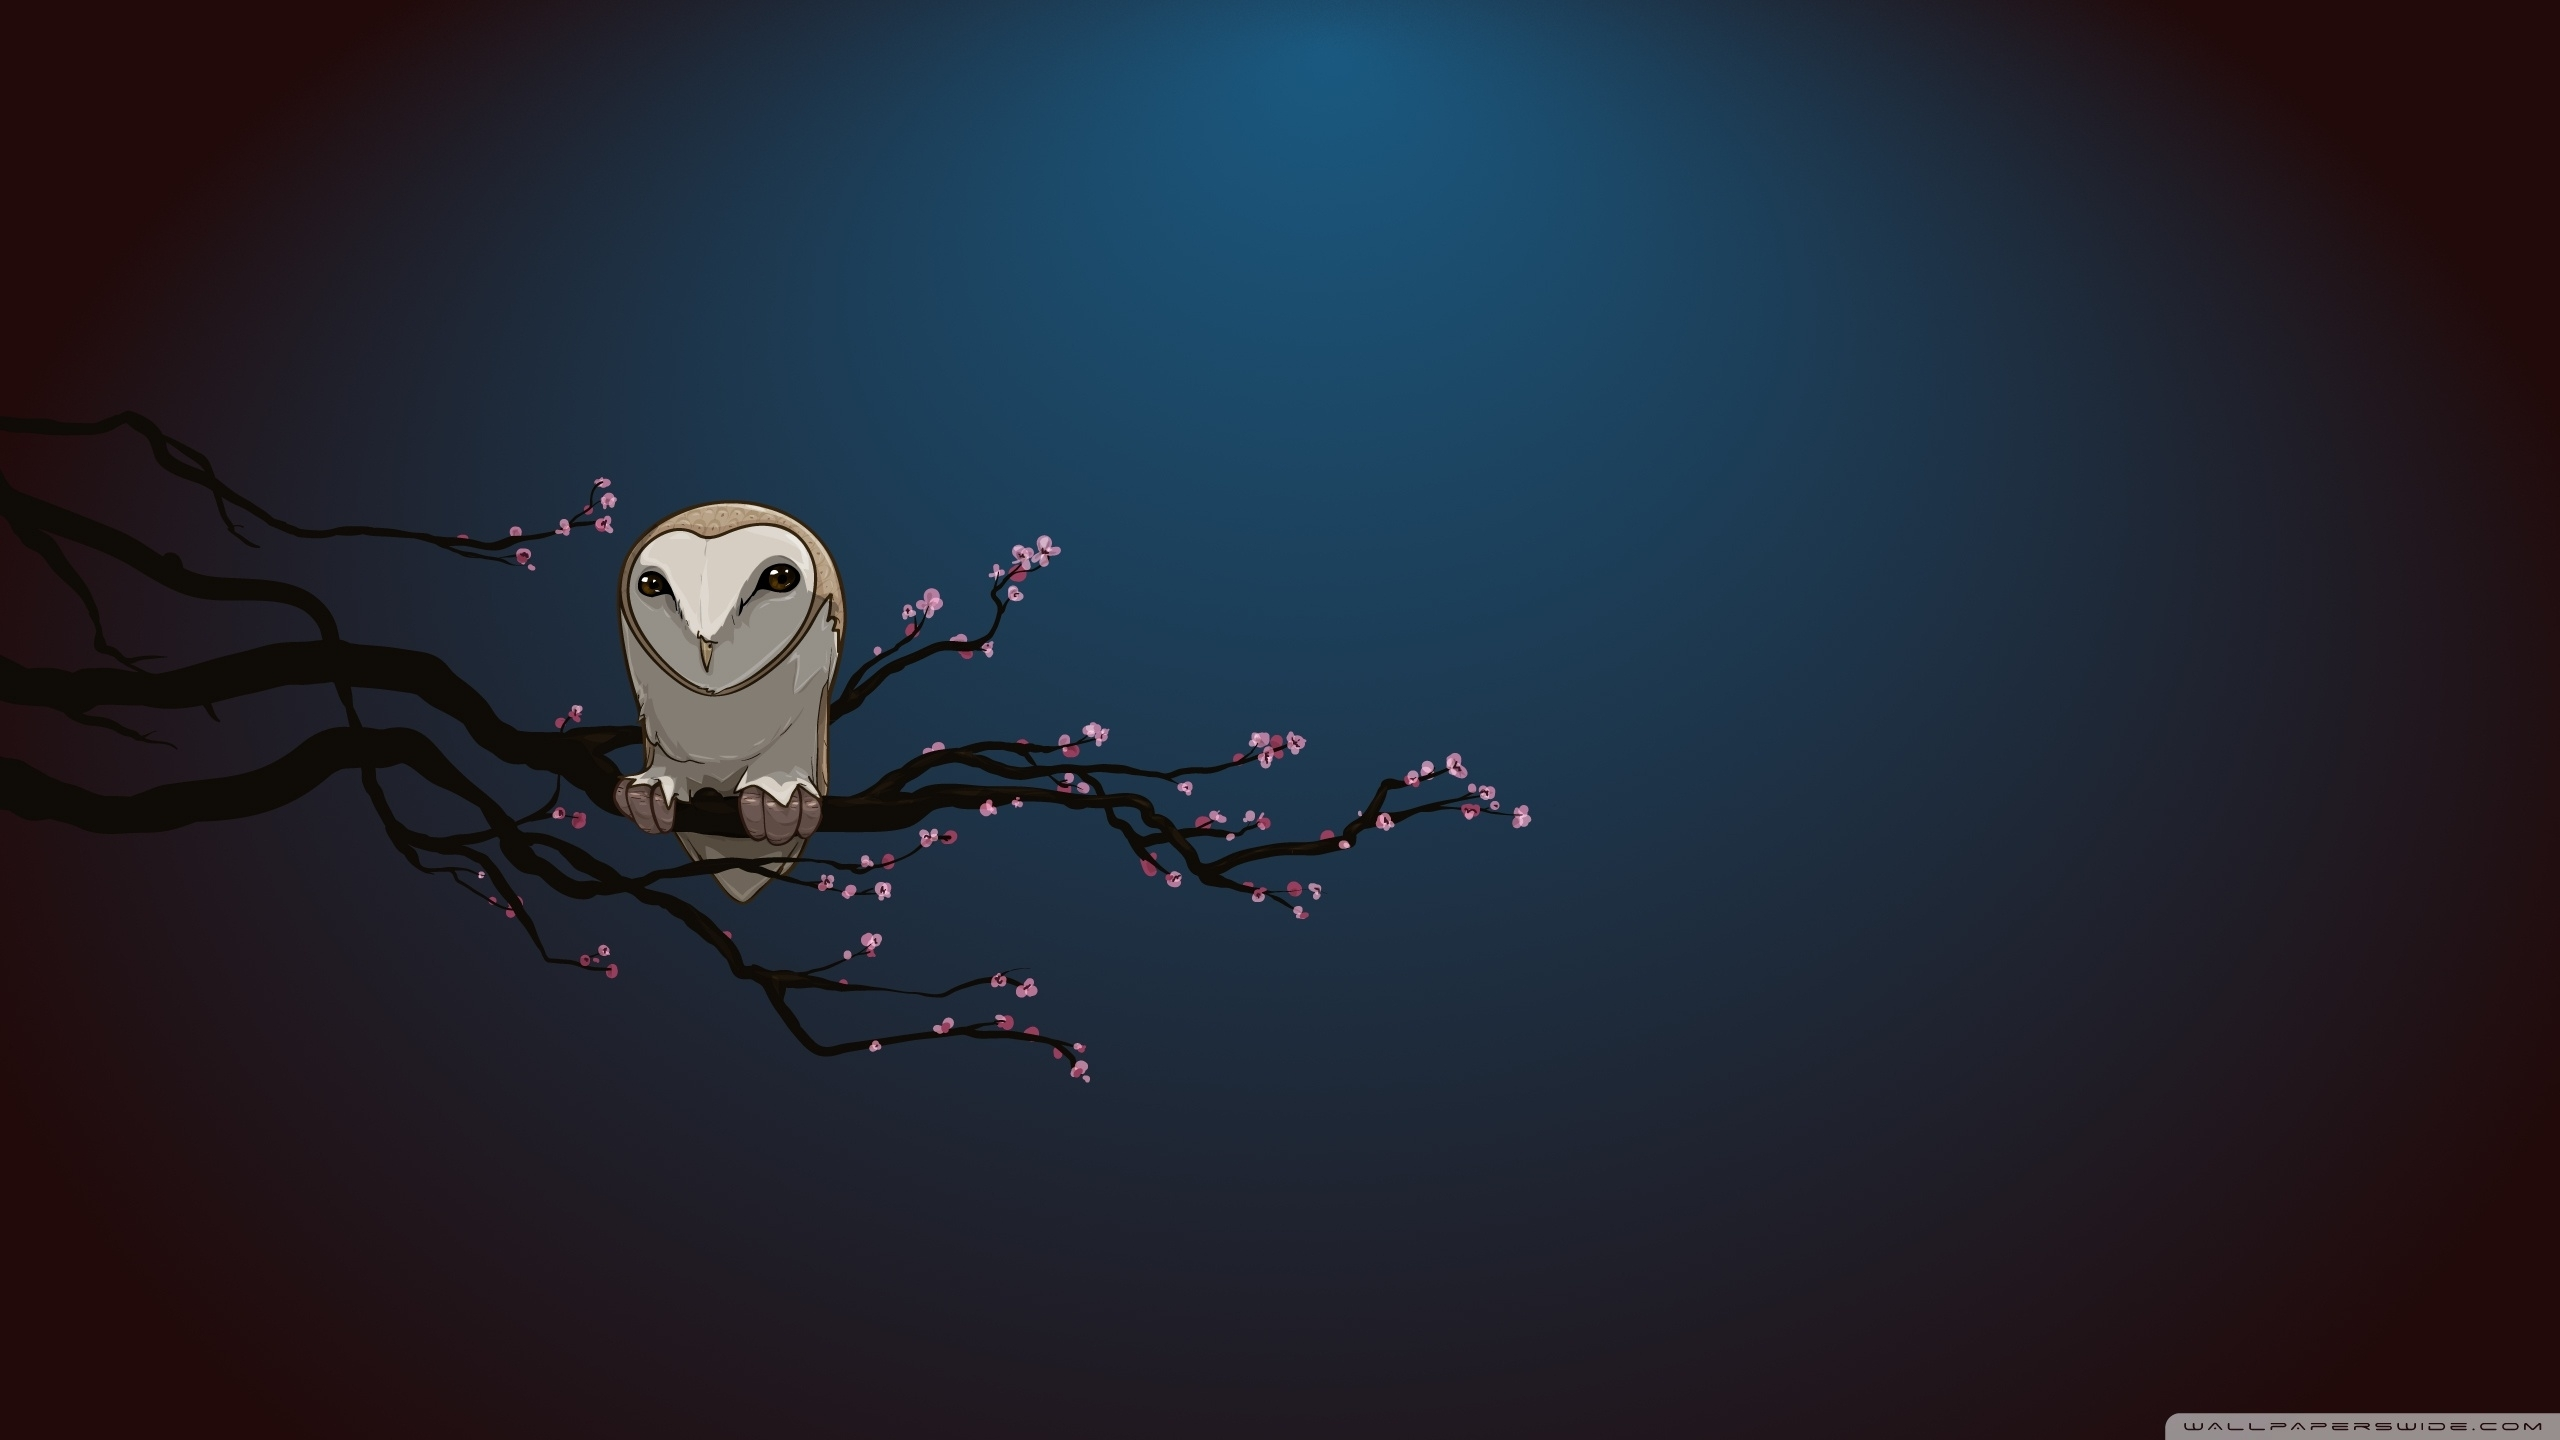 masked owl vector art ❤ 4k hd desktop wallpaper for 4k ultra hd tv